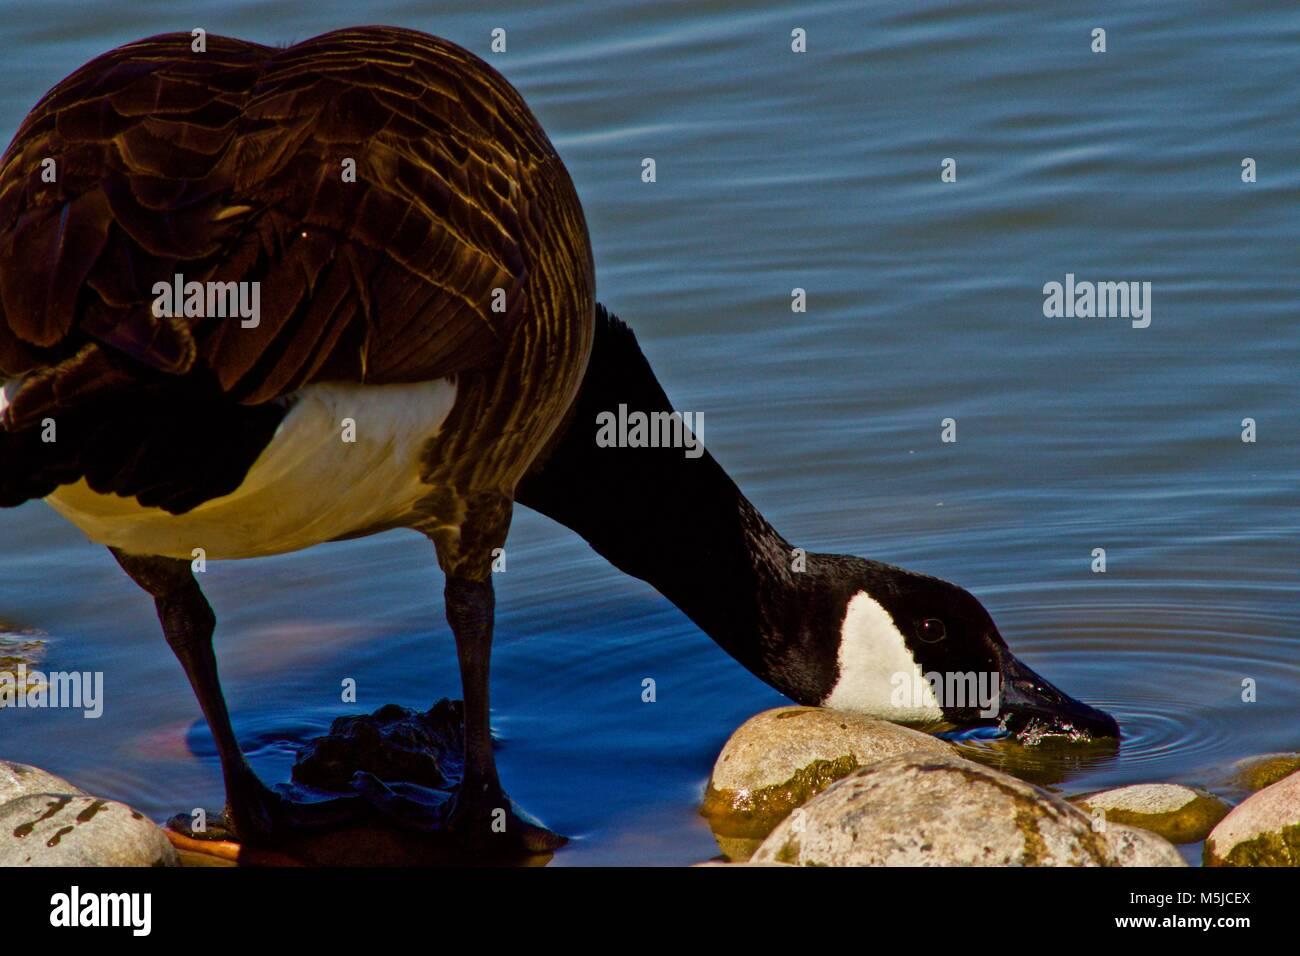 Canada Goose at Lindsey Park Public Fishing Lake, Canyon, Texas Stock Photo